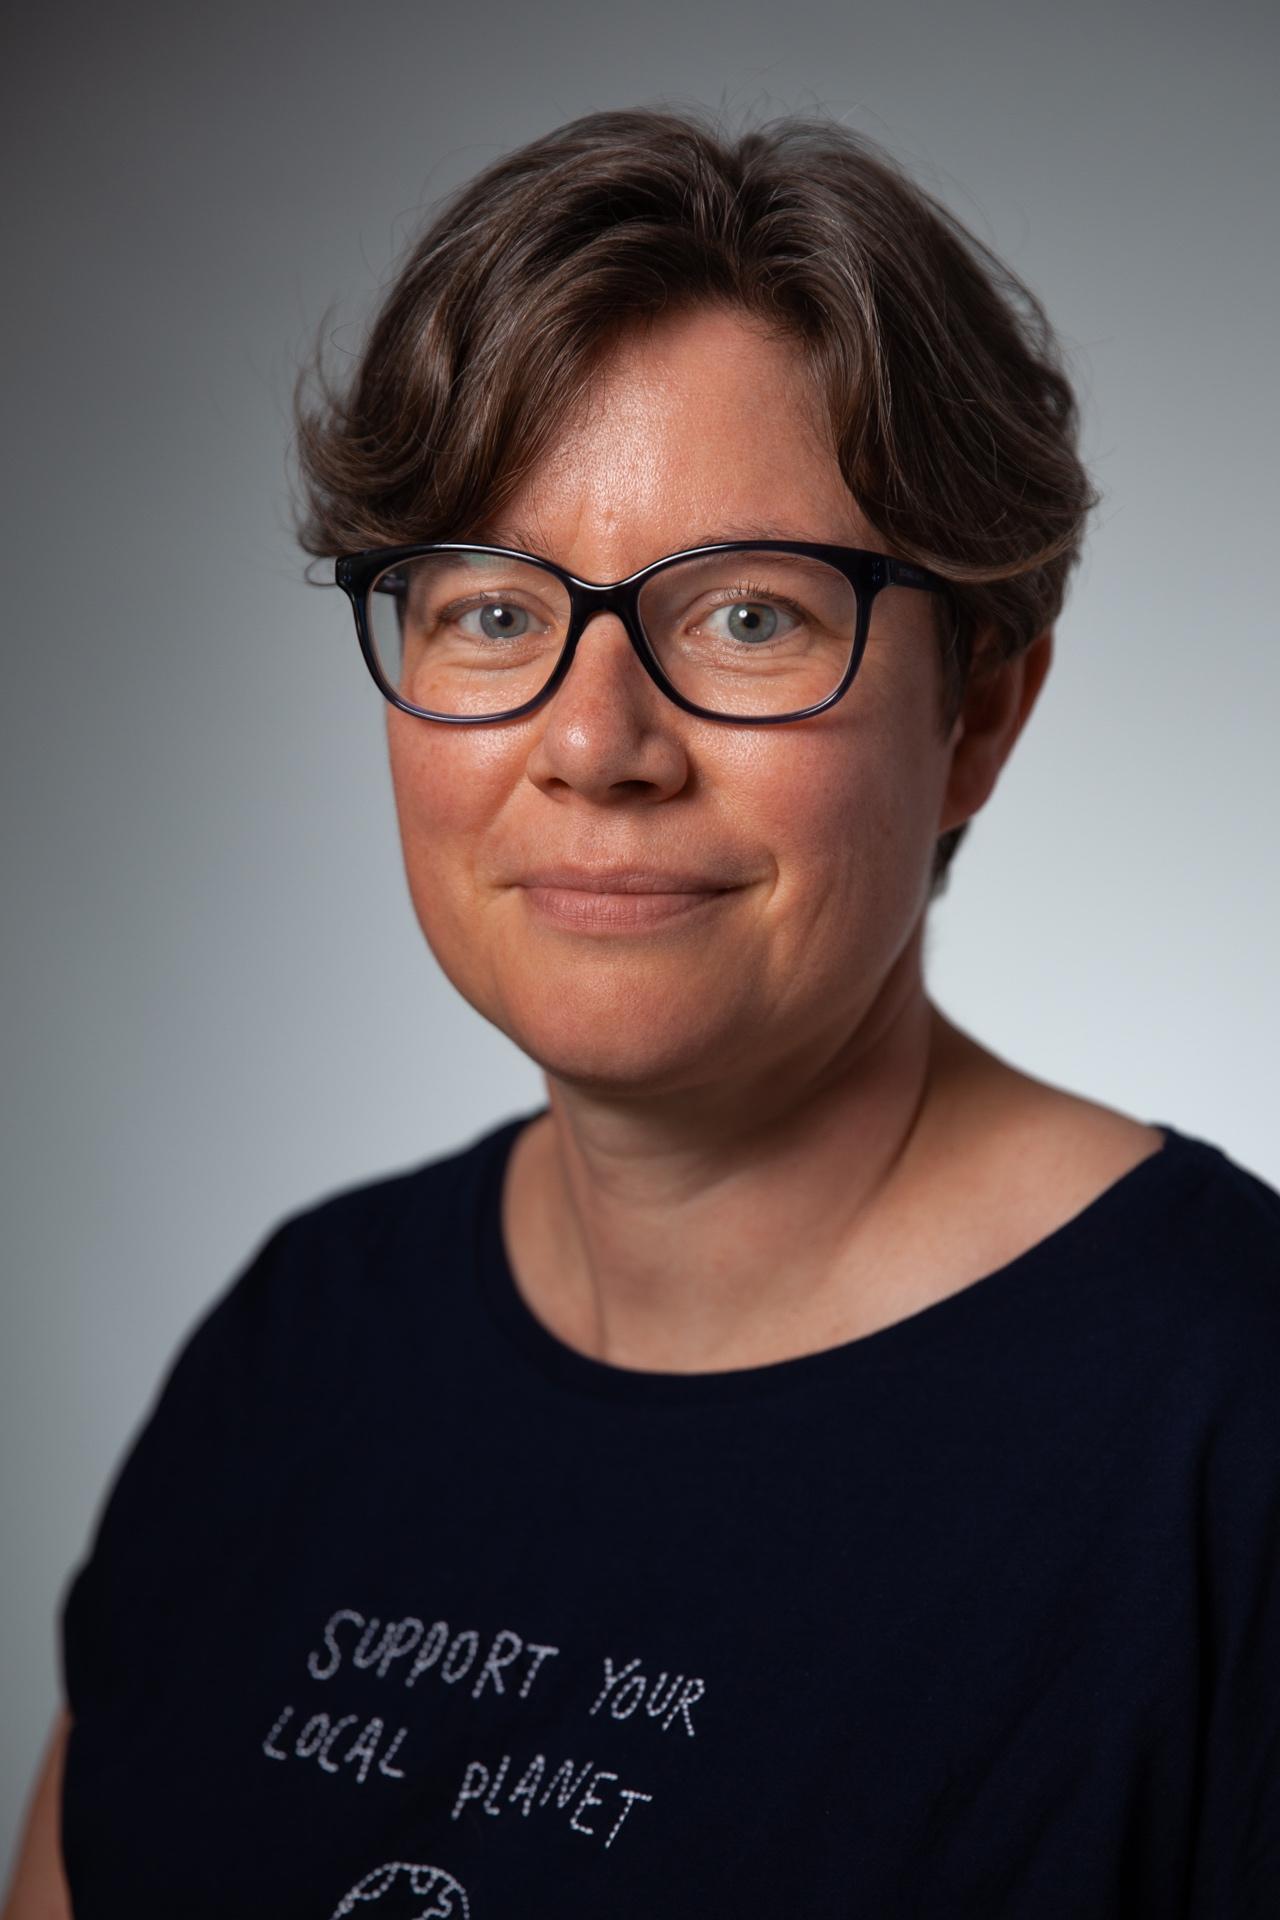 Helle Meibom Færgemann